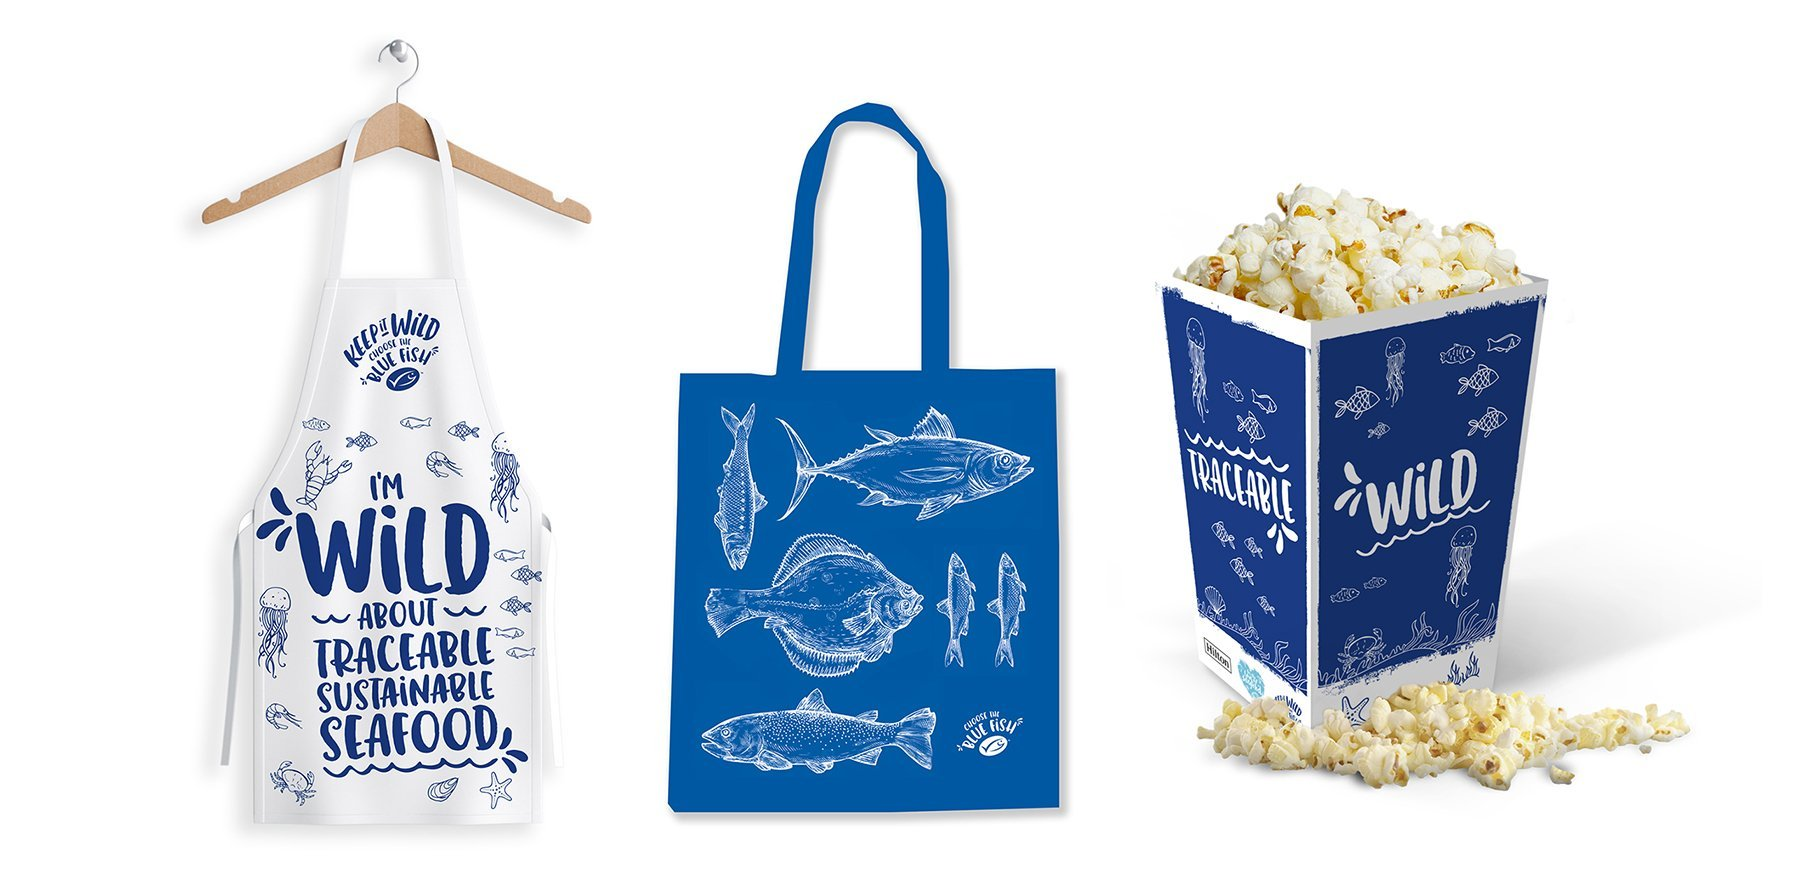 MSC anniversary – Apron, Tote Bag and Popcorn Holder